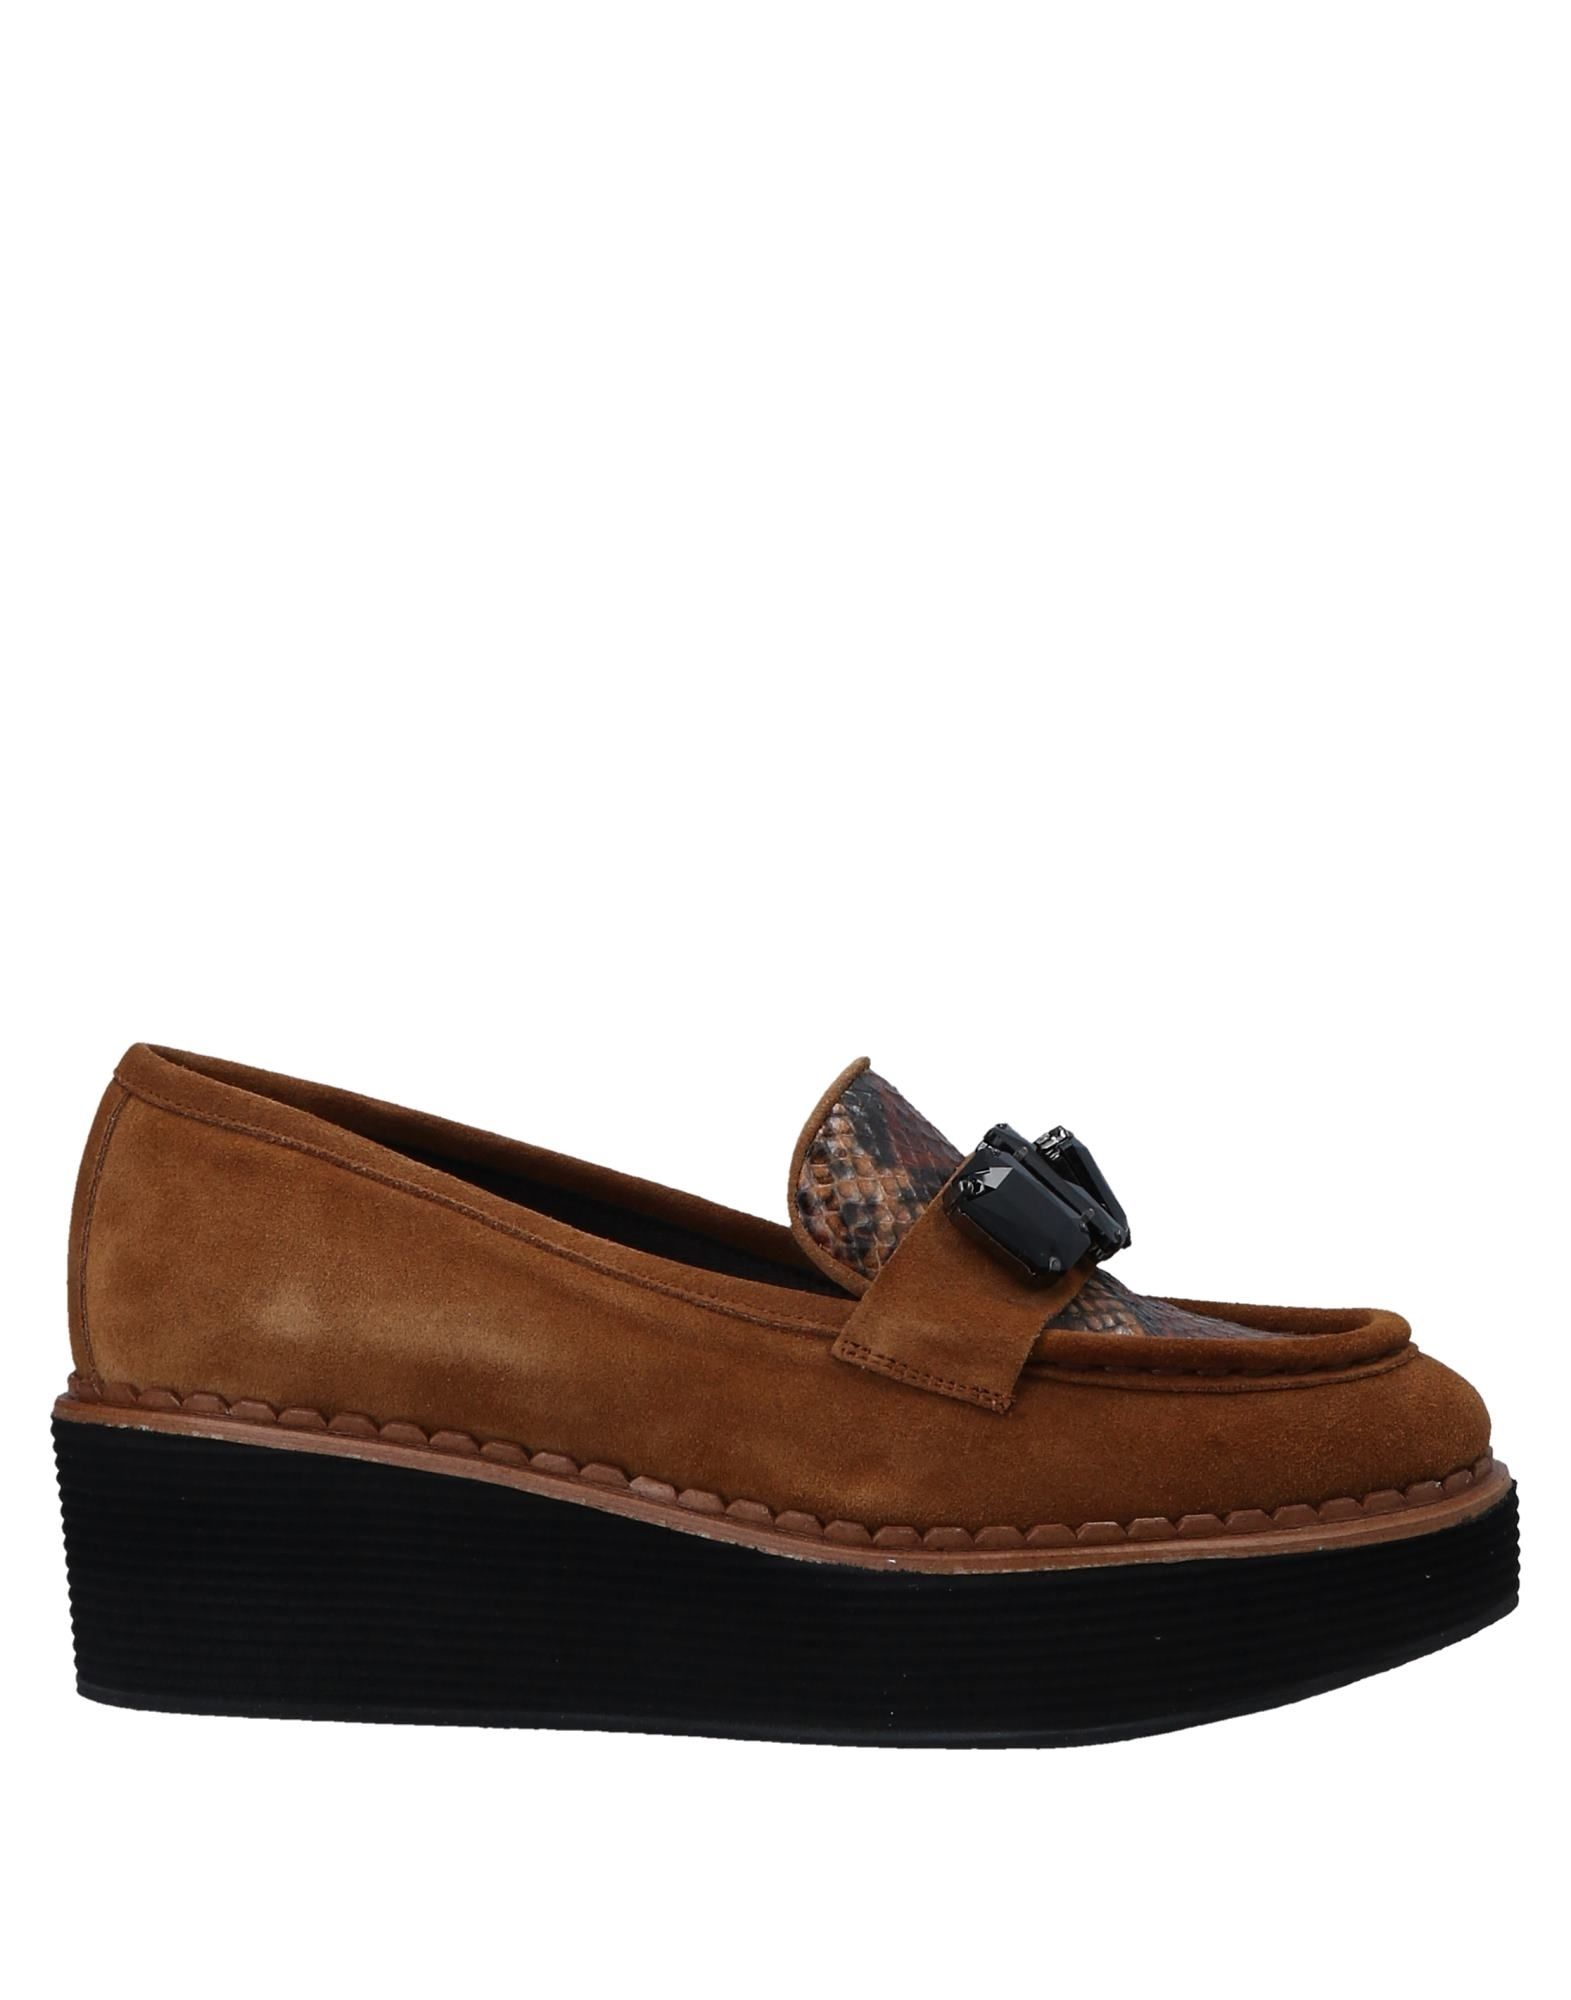 Anaki Mokassins Damen  Qualität 11552973QN Gute Qualität  beliebte Schuhe 988ea2